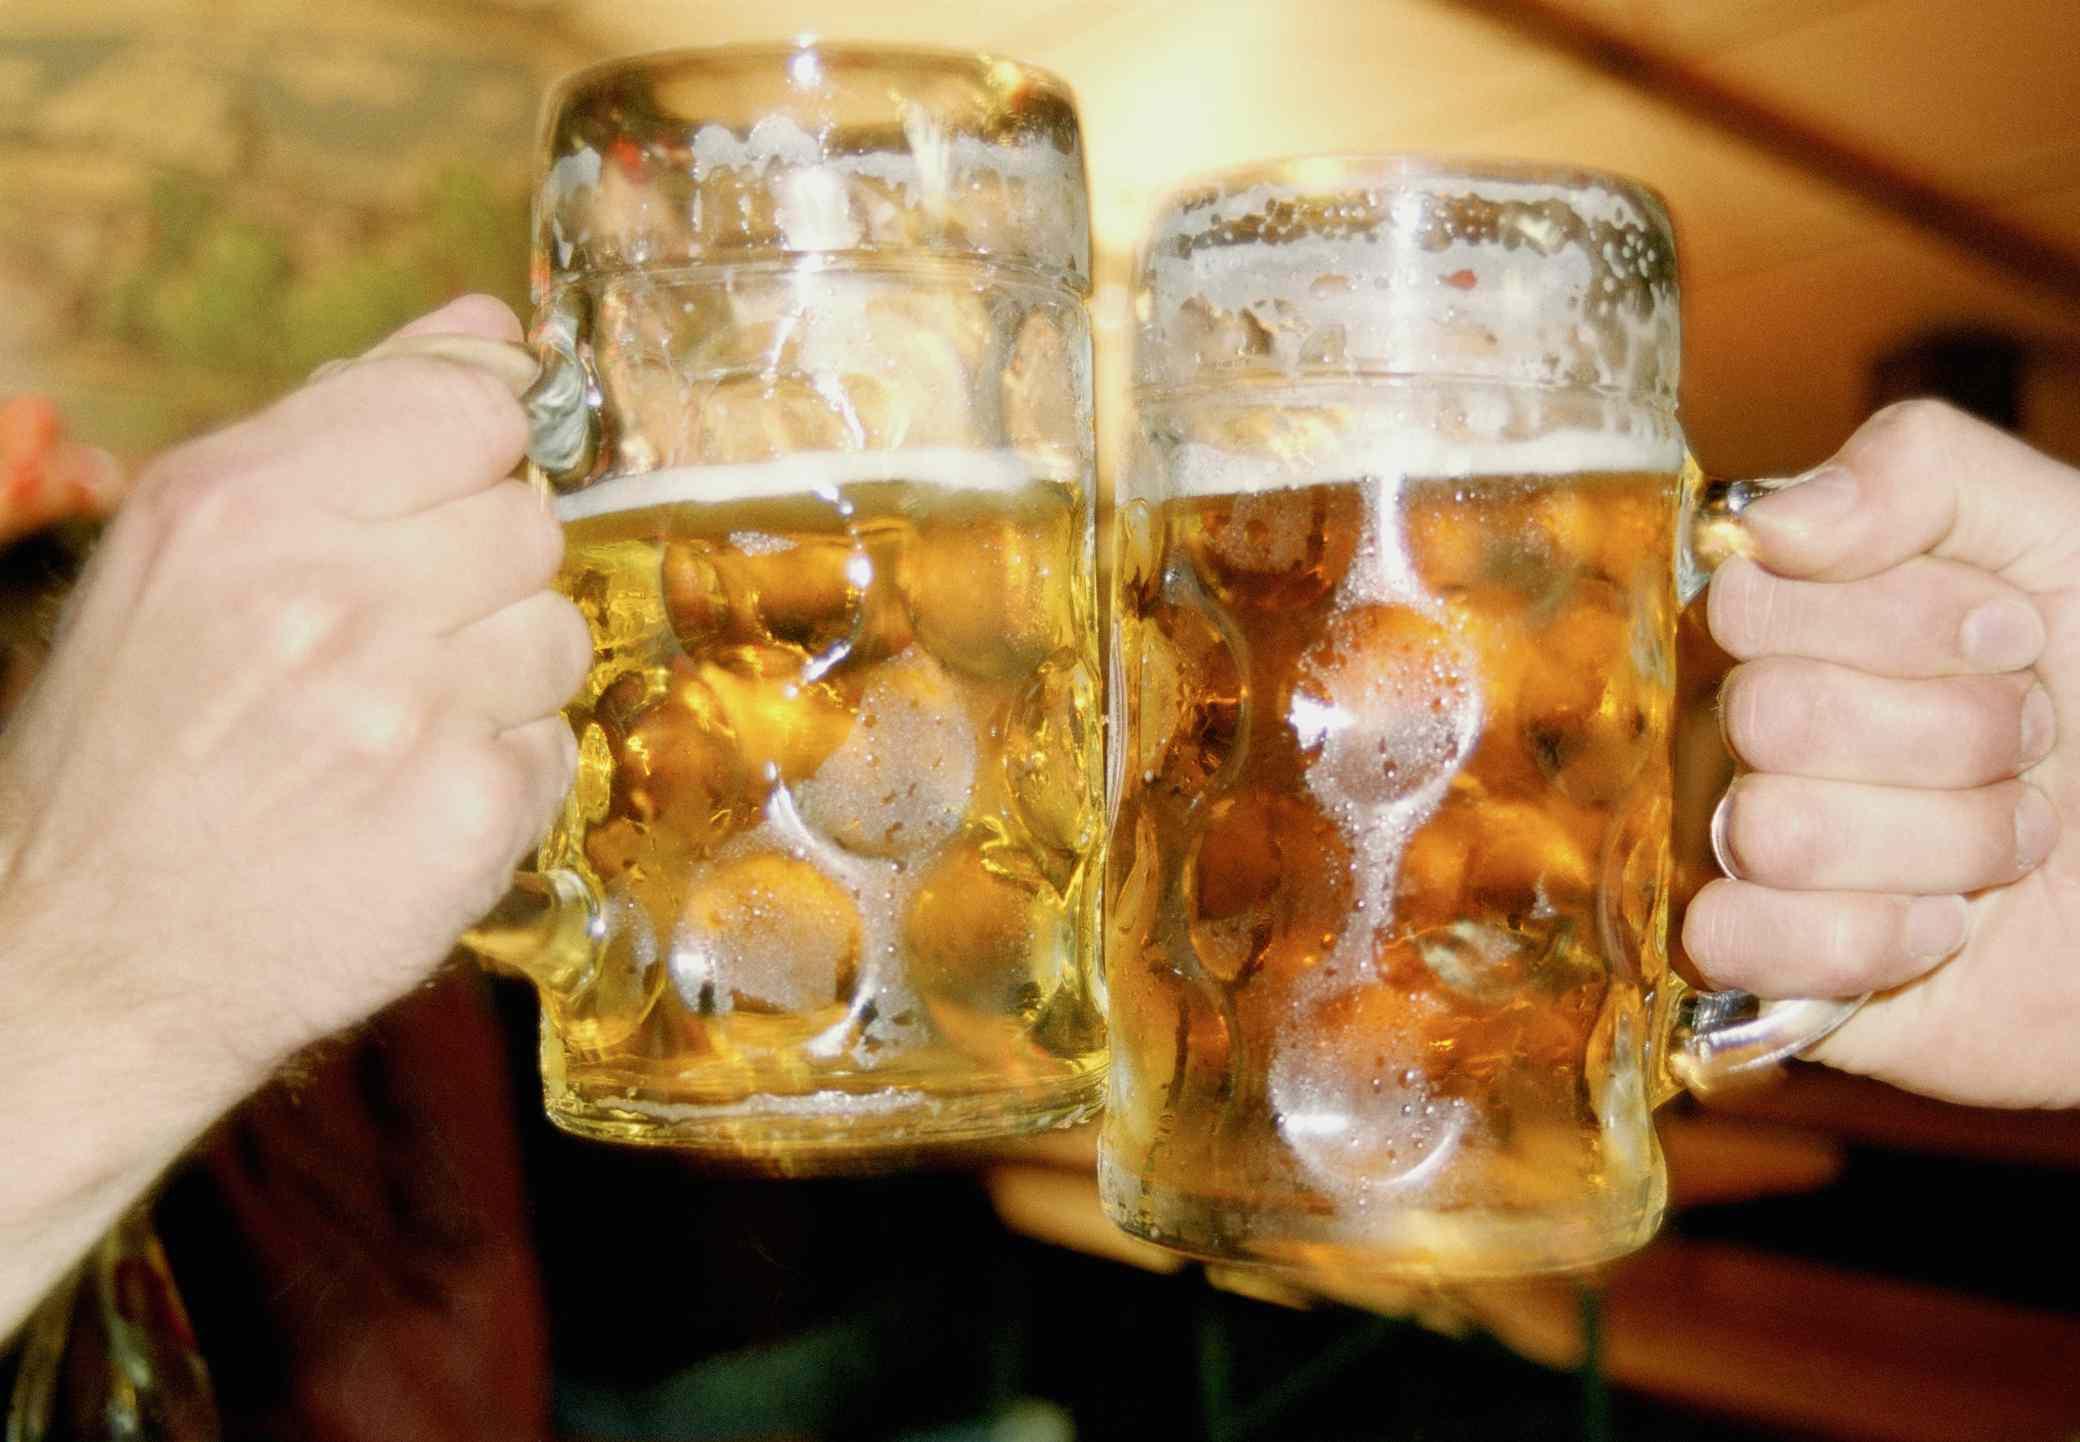 Tostado con cerveza en un stein